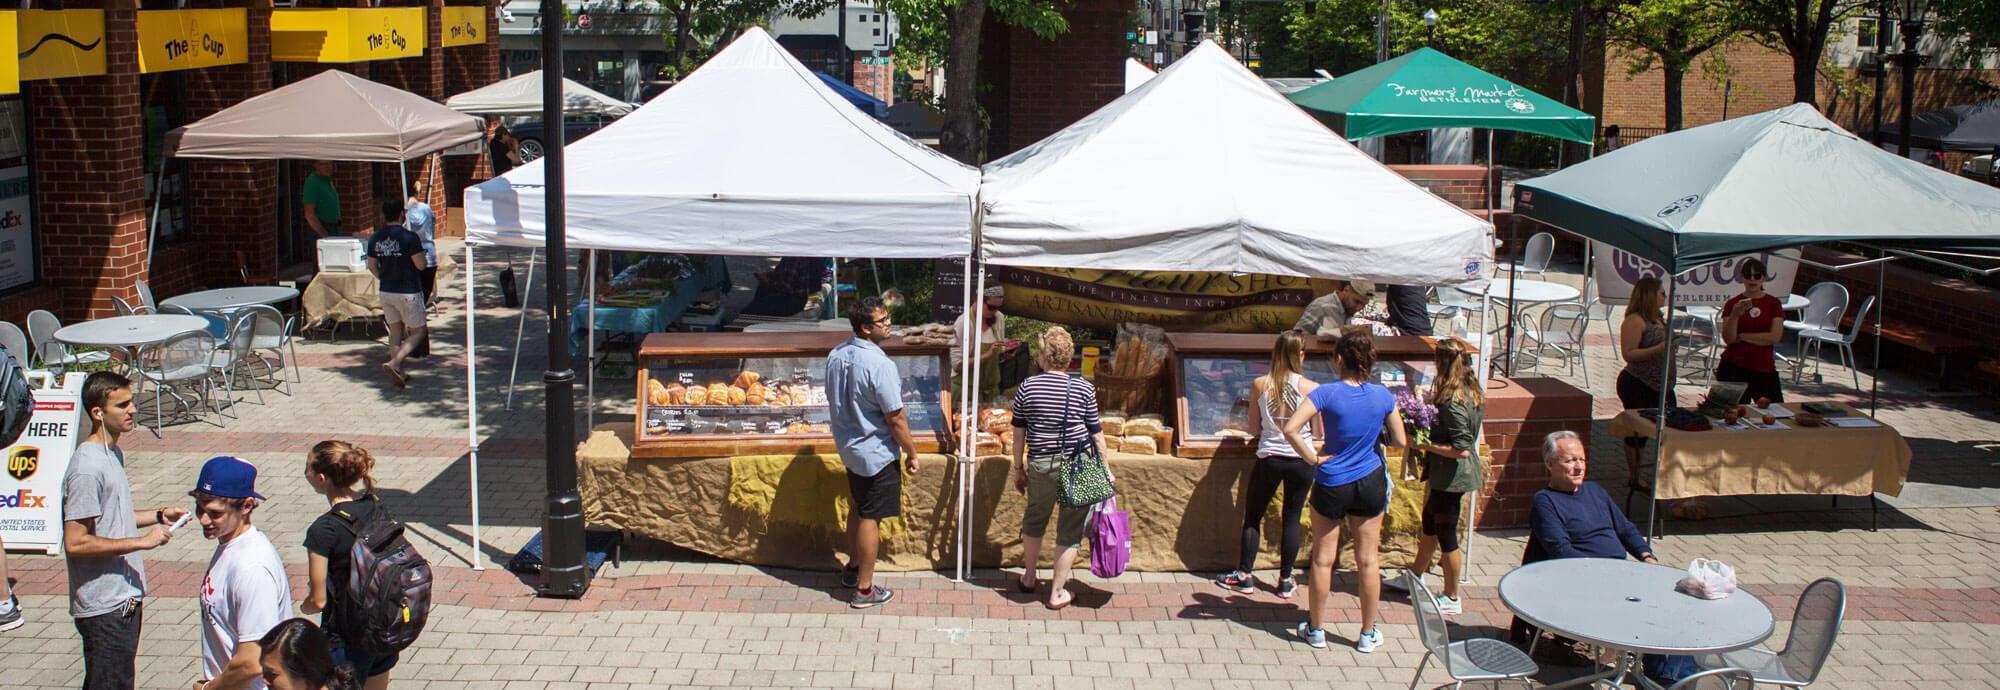 Farmer's Market in Farrington Square